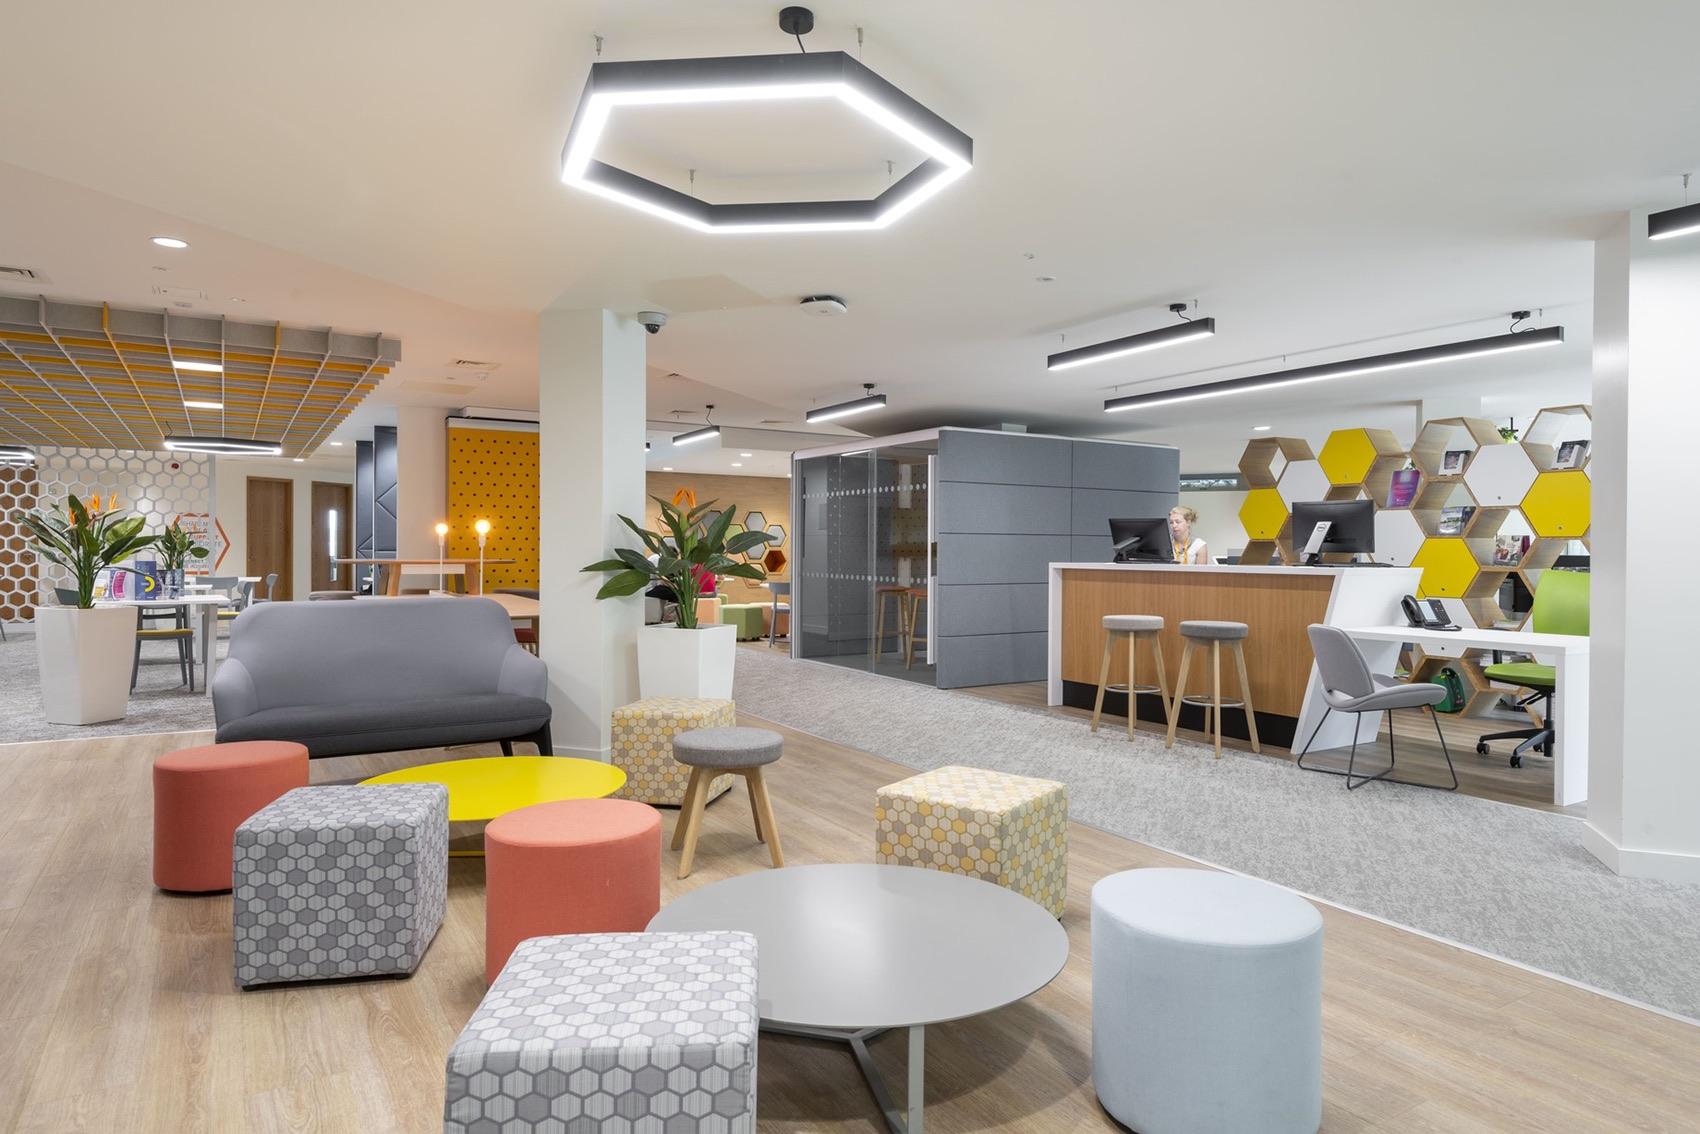 A Peek Inside University of Surrey's Workspace in Guildford